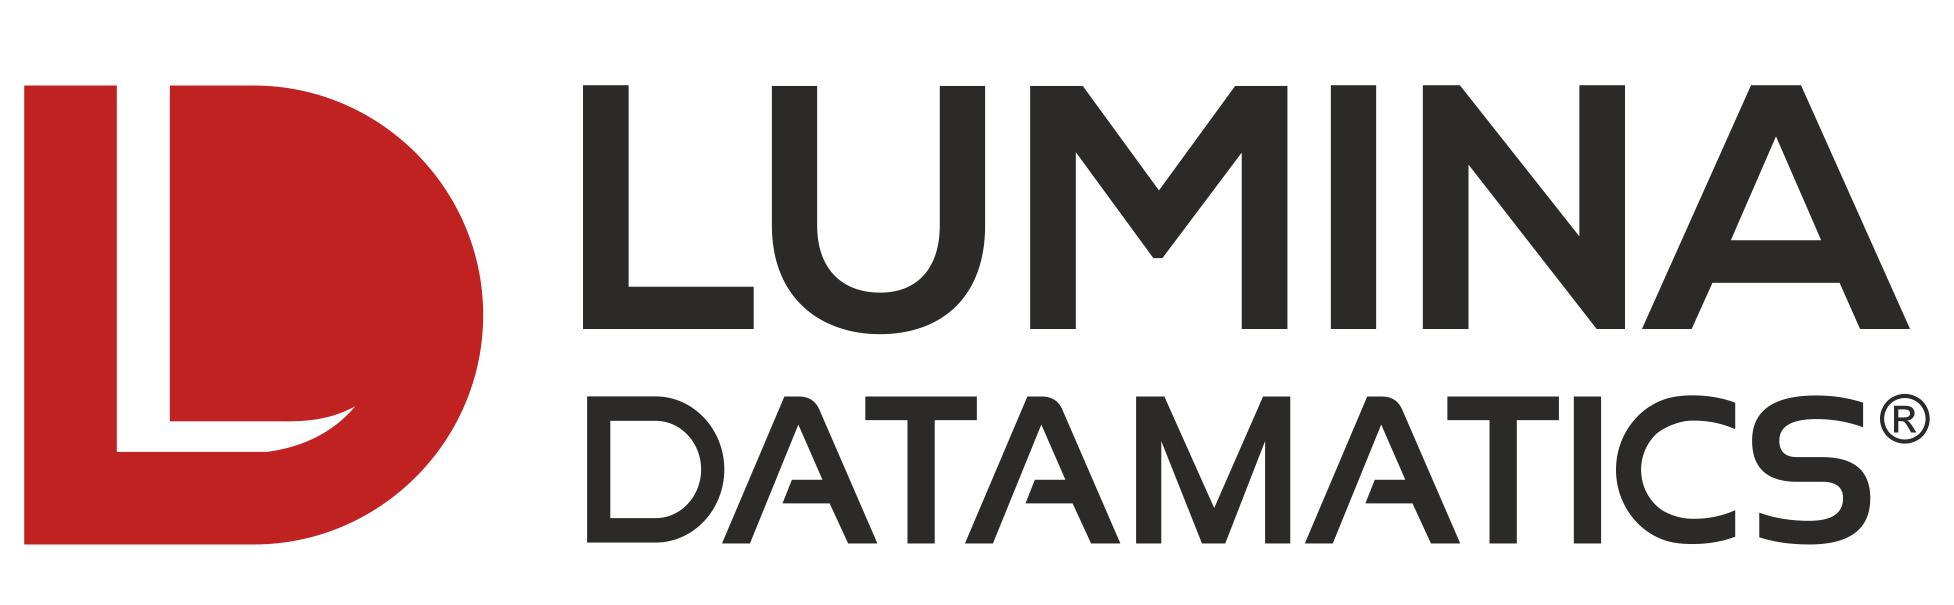 Lumina Datamatics, Inc.